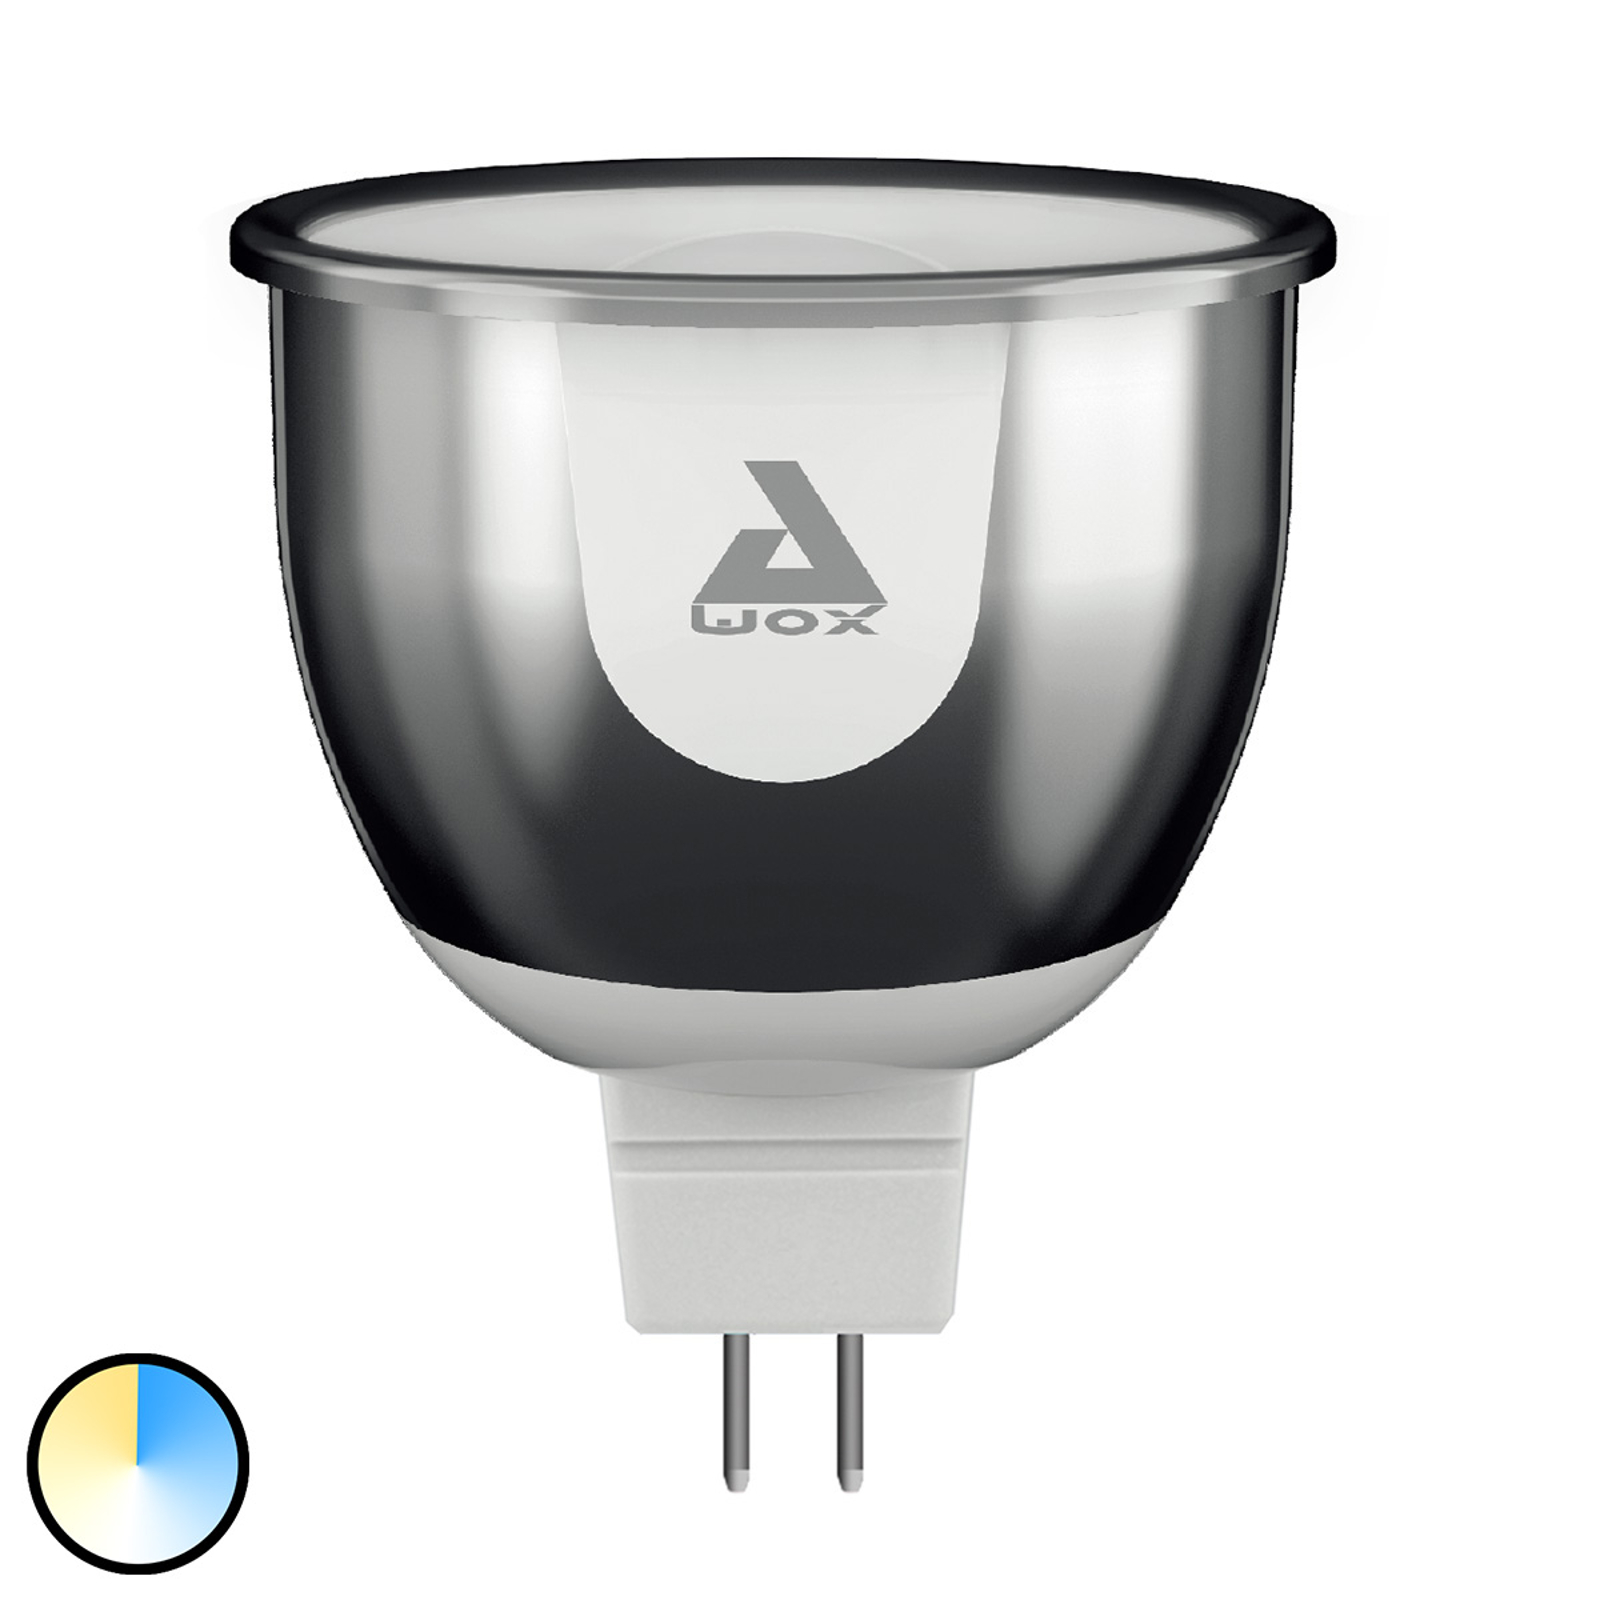 AwoX SmartLIGHT LEDreflektor GU5.3 2 700-6 000K 4W